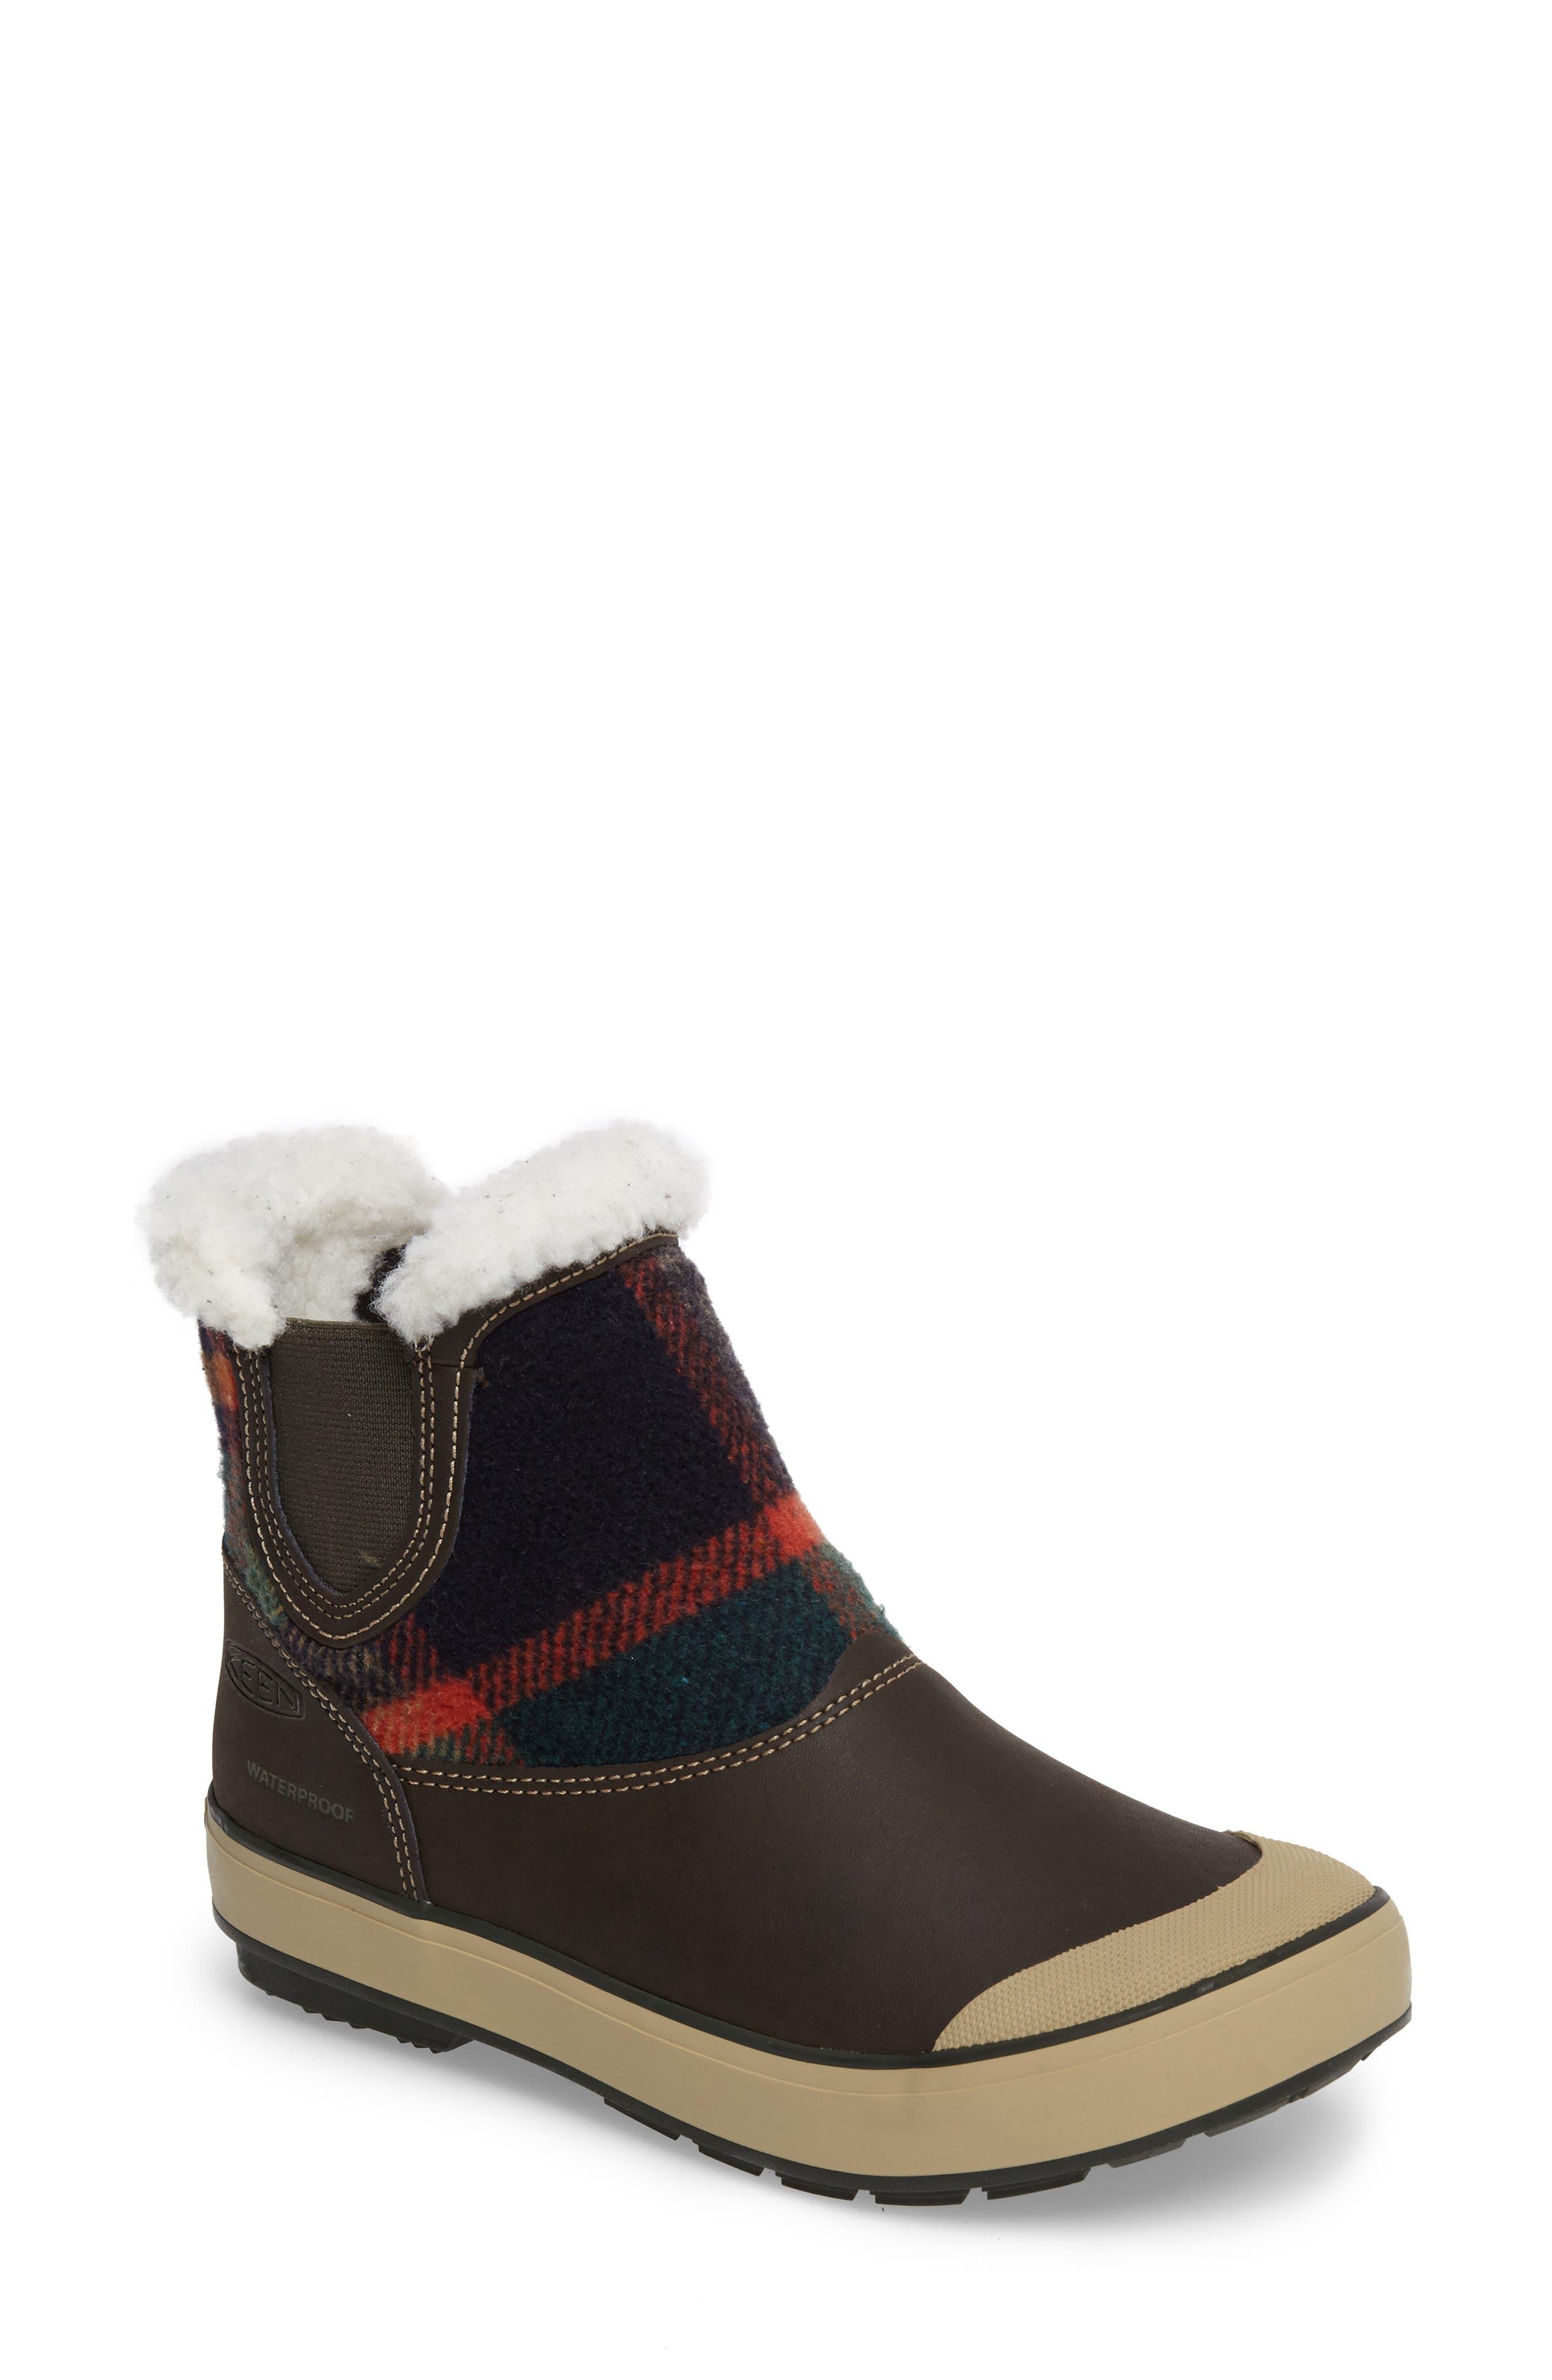 Alternate Image 1 Selected - Keen Elsa Chelsea Waterproof Faux Fur Lined Boot (Women)